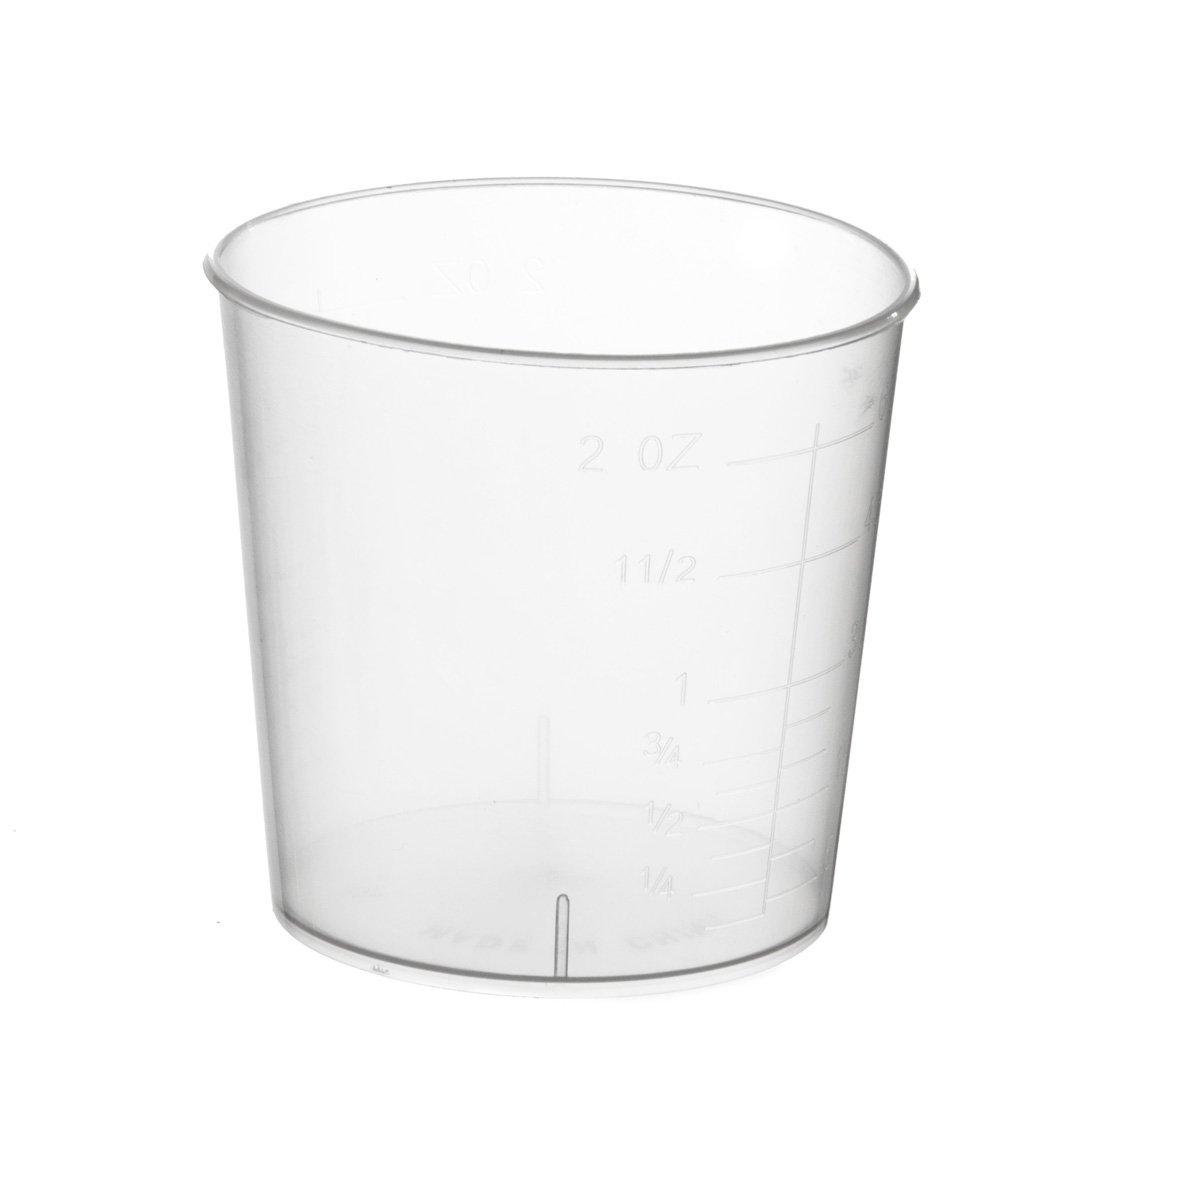 Medline DYNJ05195 Sterile Graduated Plastic Medicine Cups (Pack of 100)